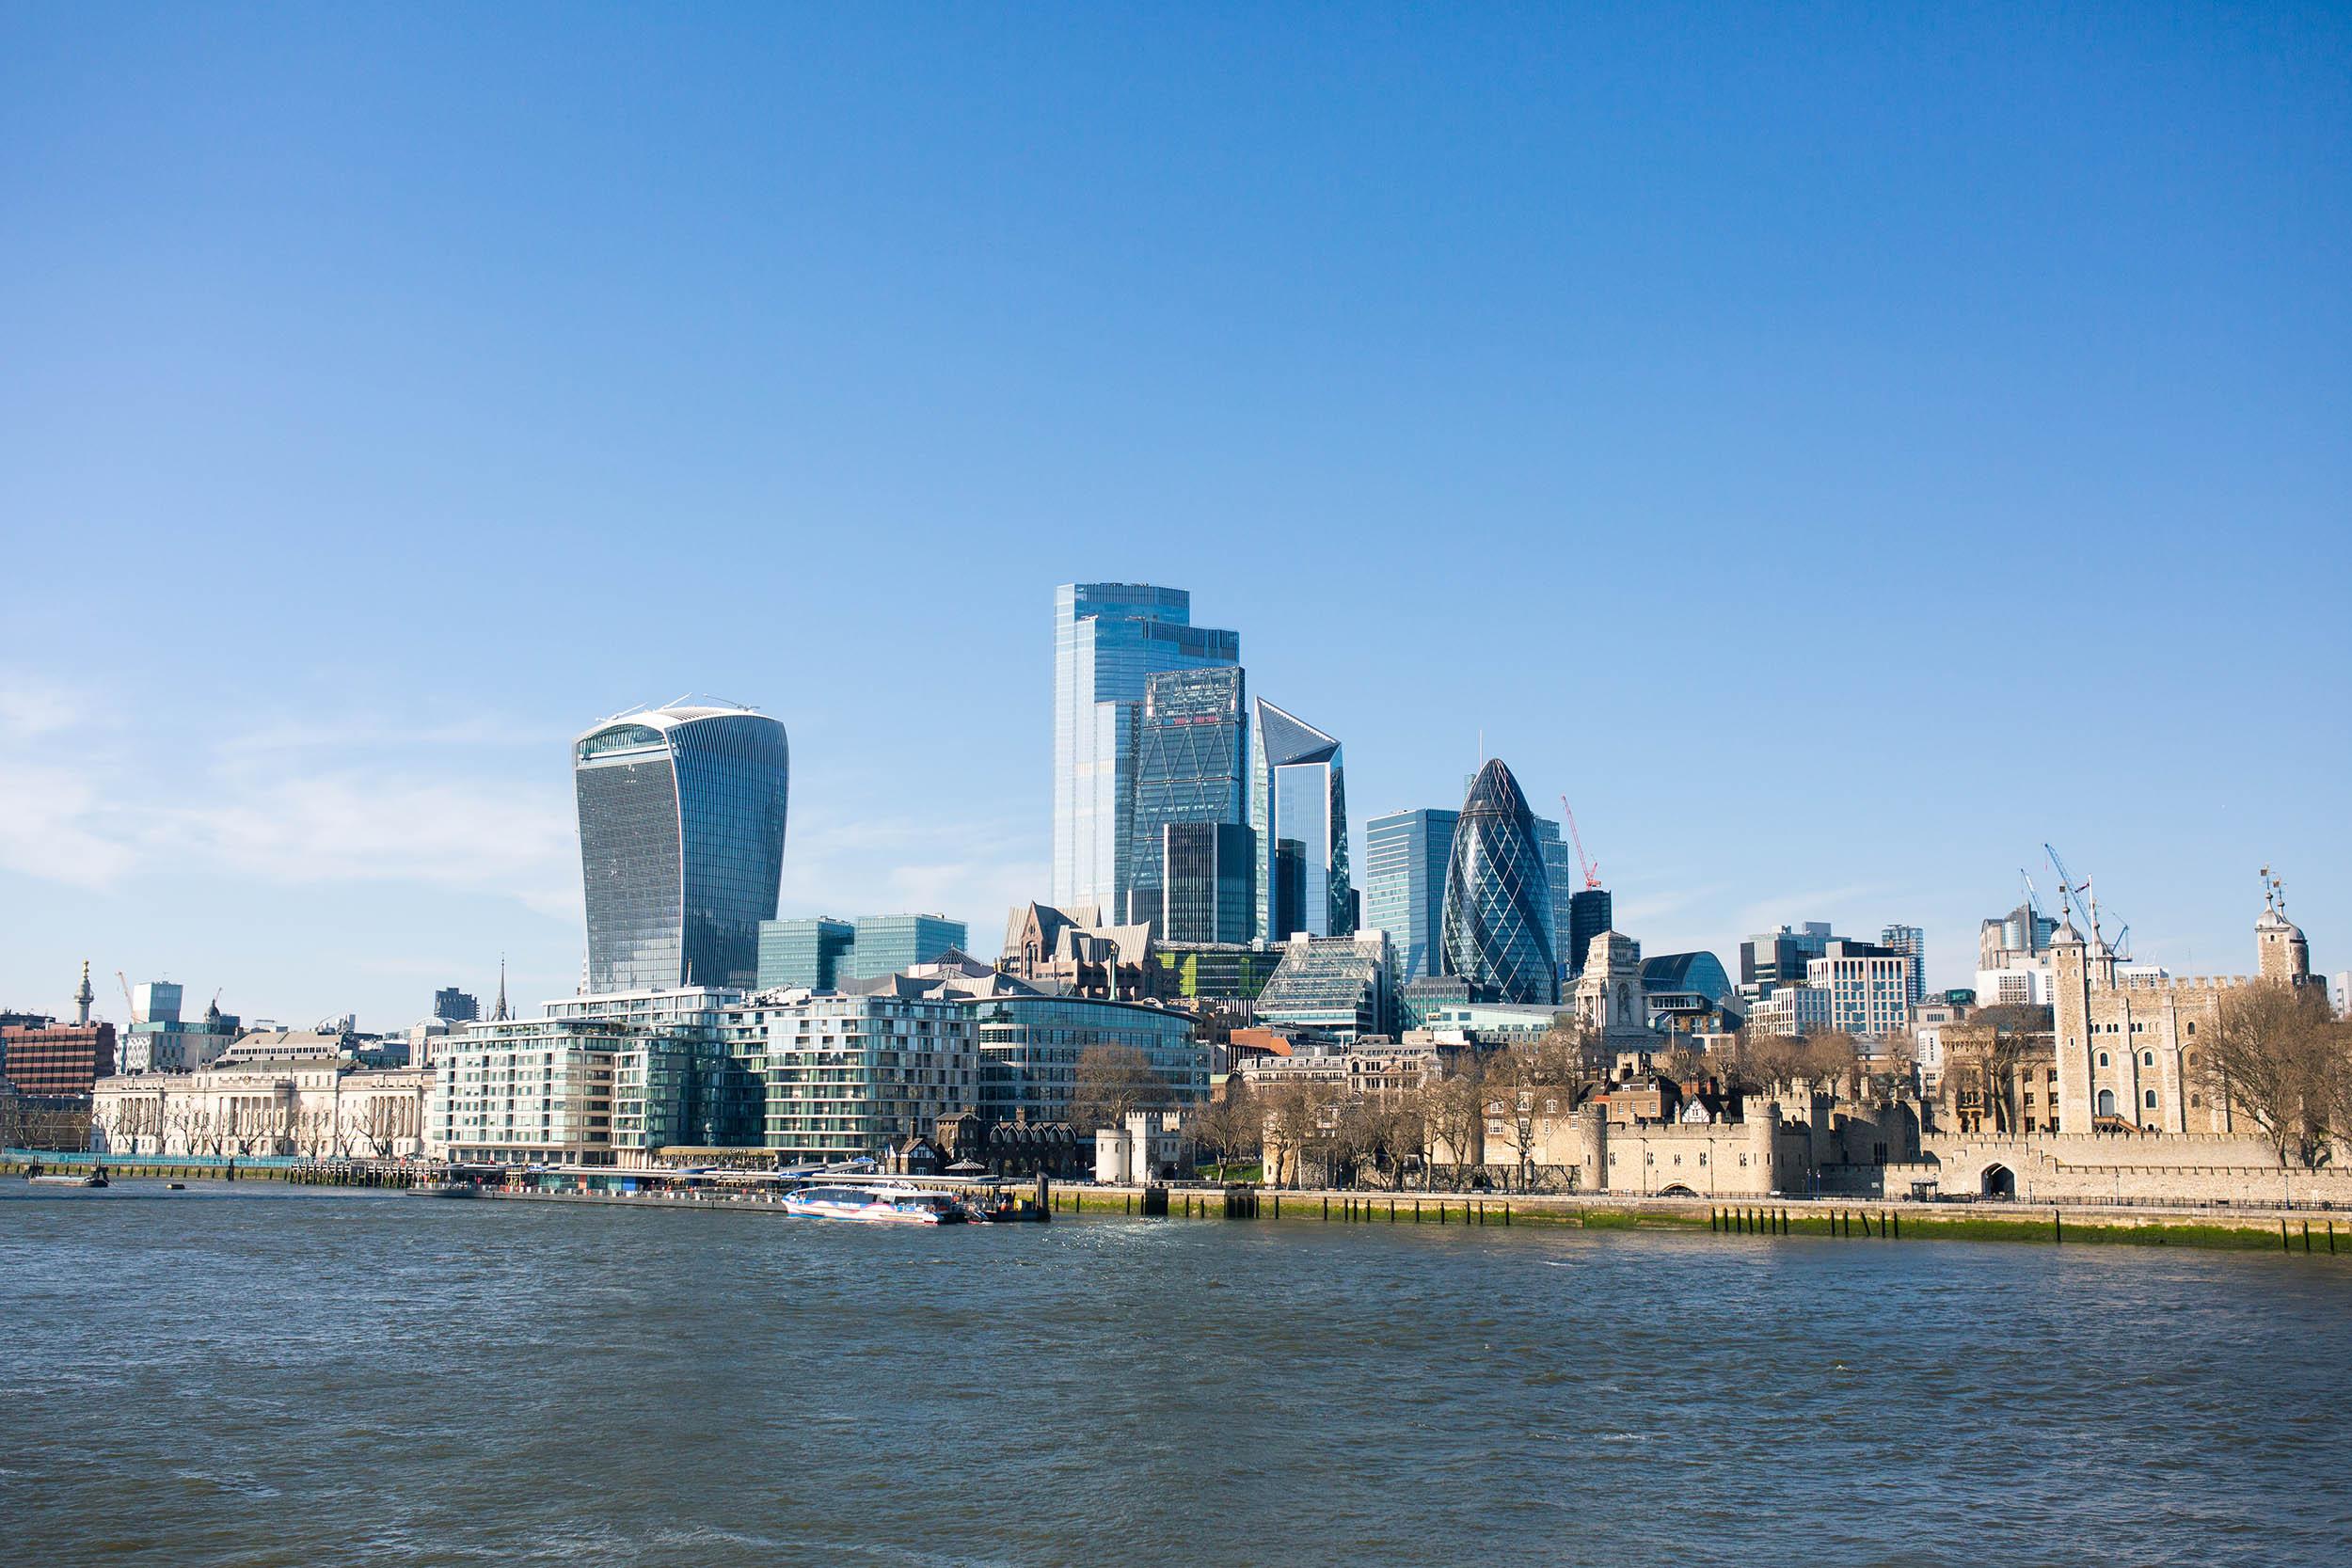 ENGLAND_LONDON_TOWERBRIDGE_0008